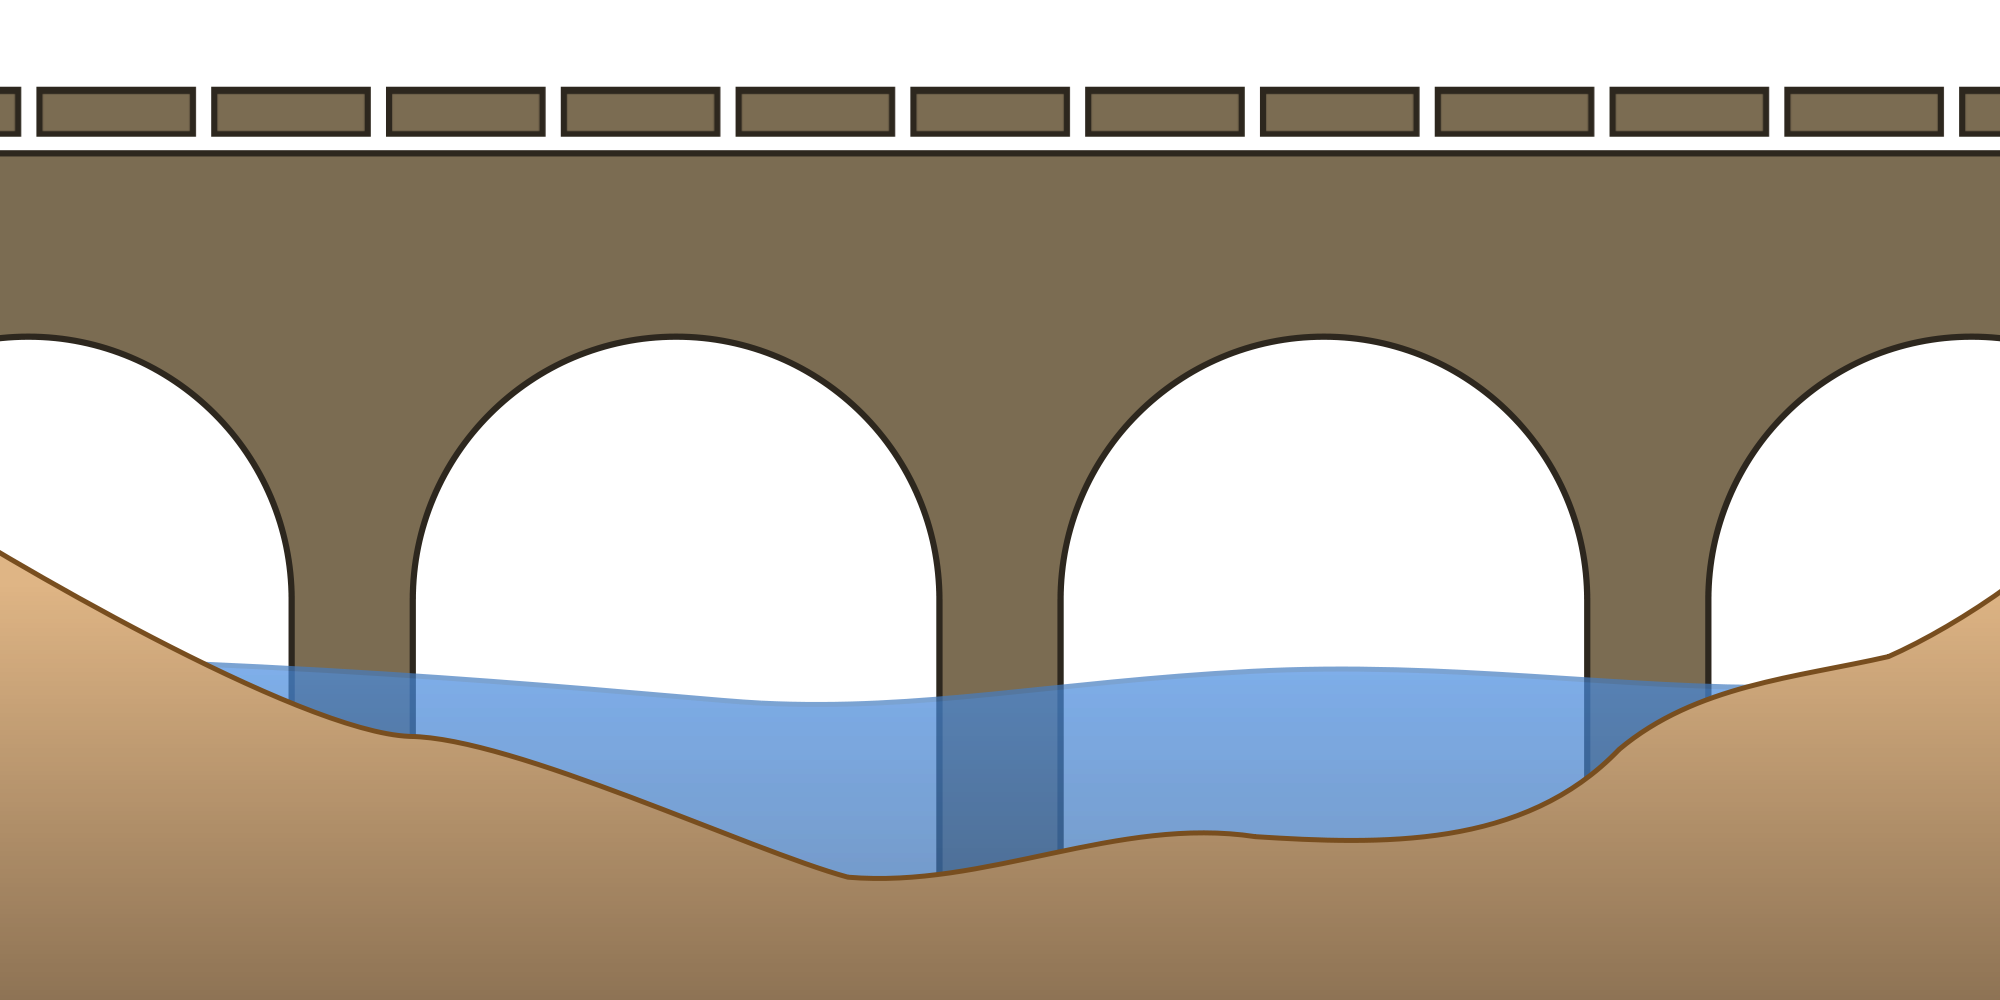 free download Arch Bridge Drawing at GetDrawings